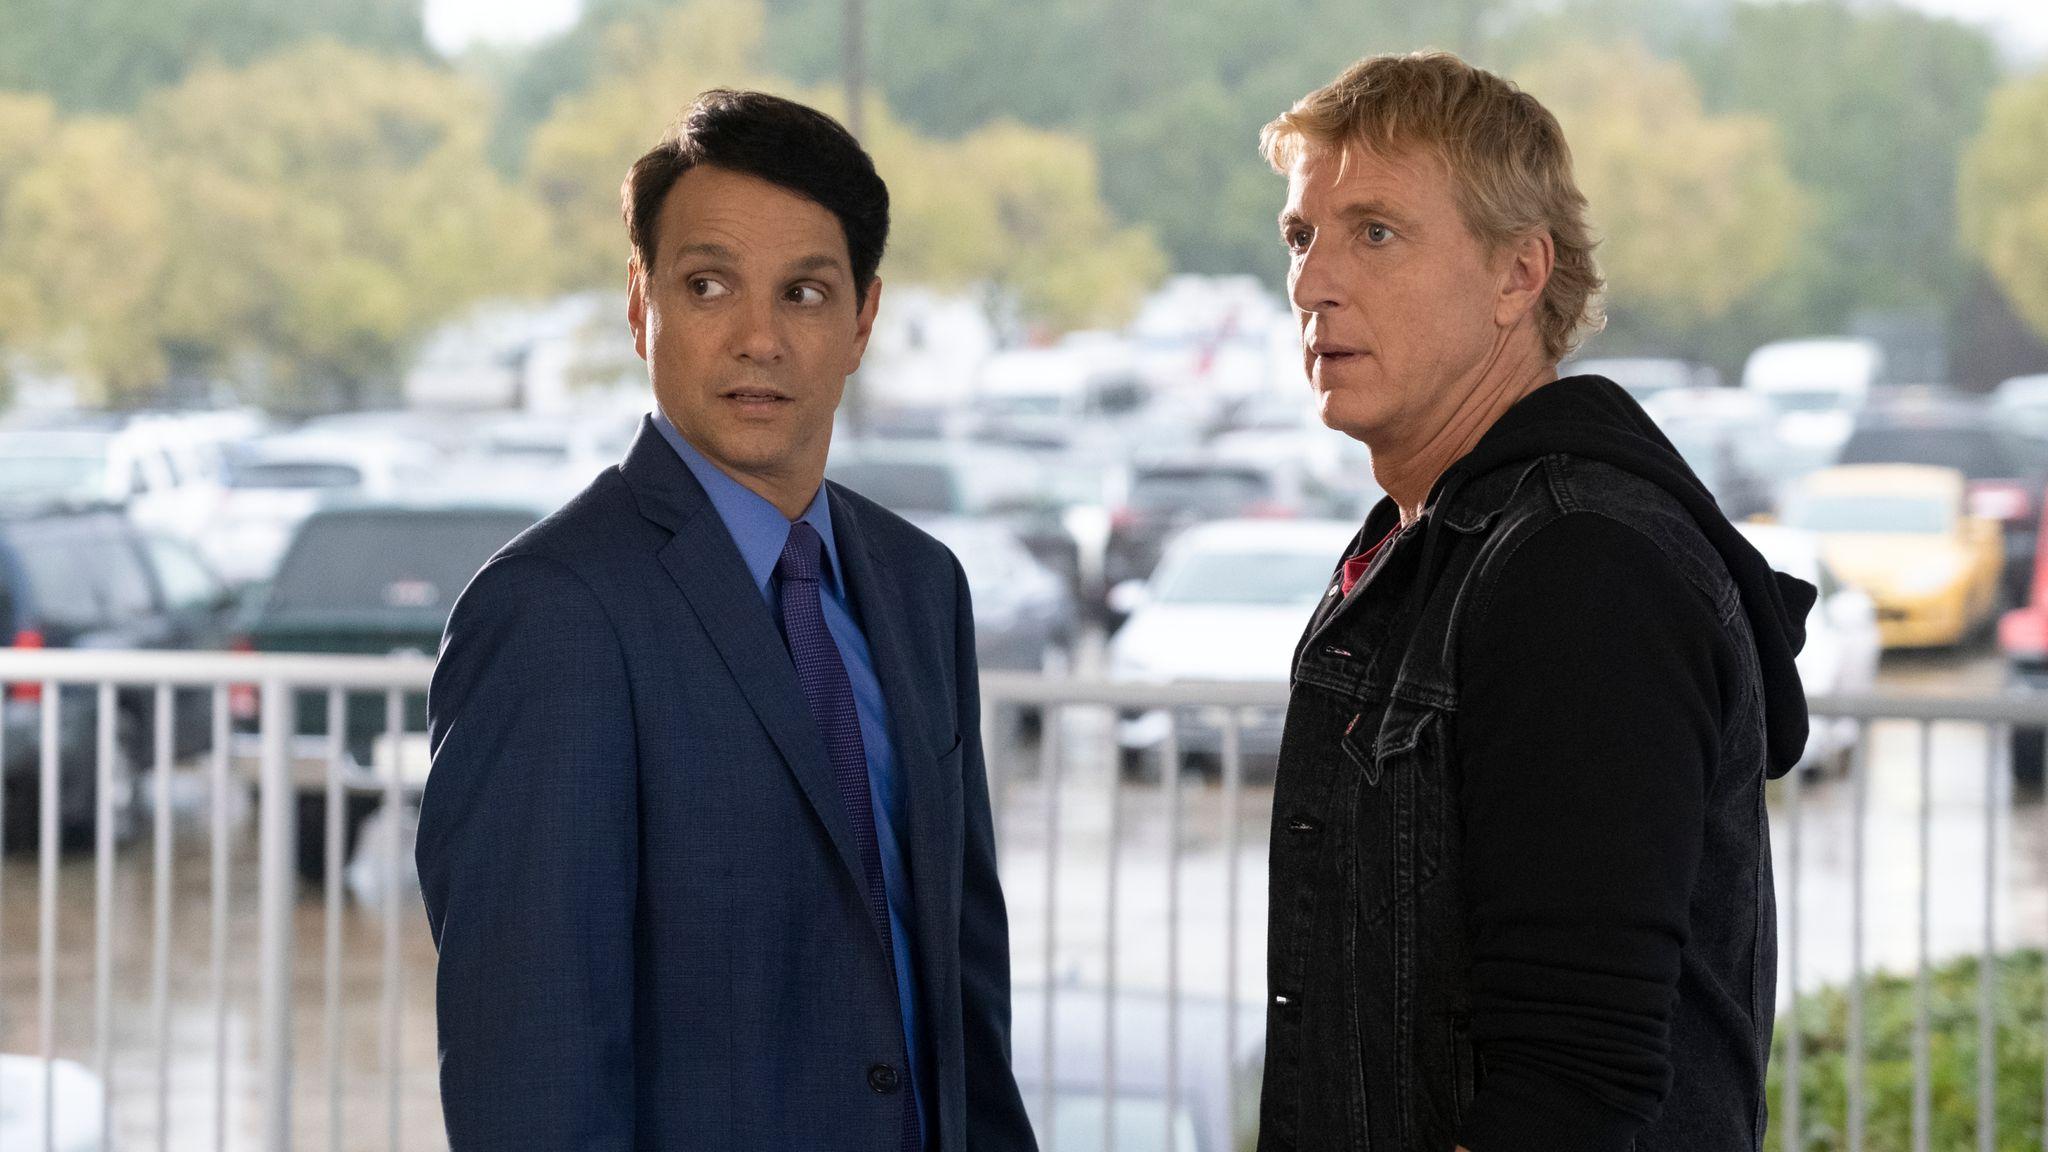 Ralph Macchio as Daniel Larusso and William Zabka as Johnny Lawrence in Cobra Kai. Pic: Curtis Bonds Baker/Netflix